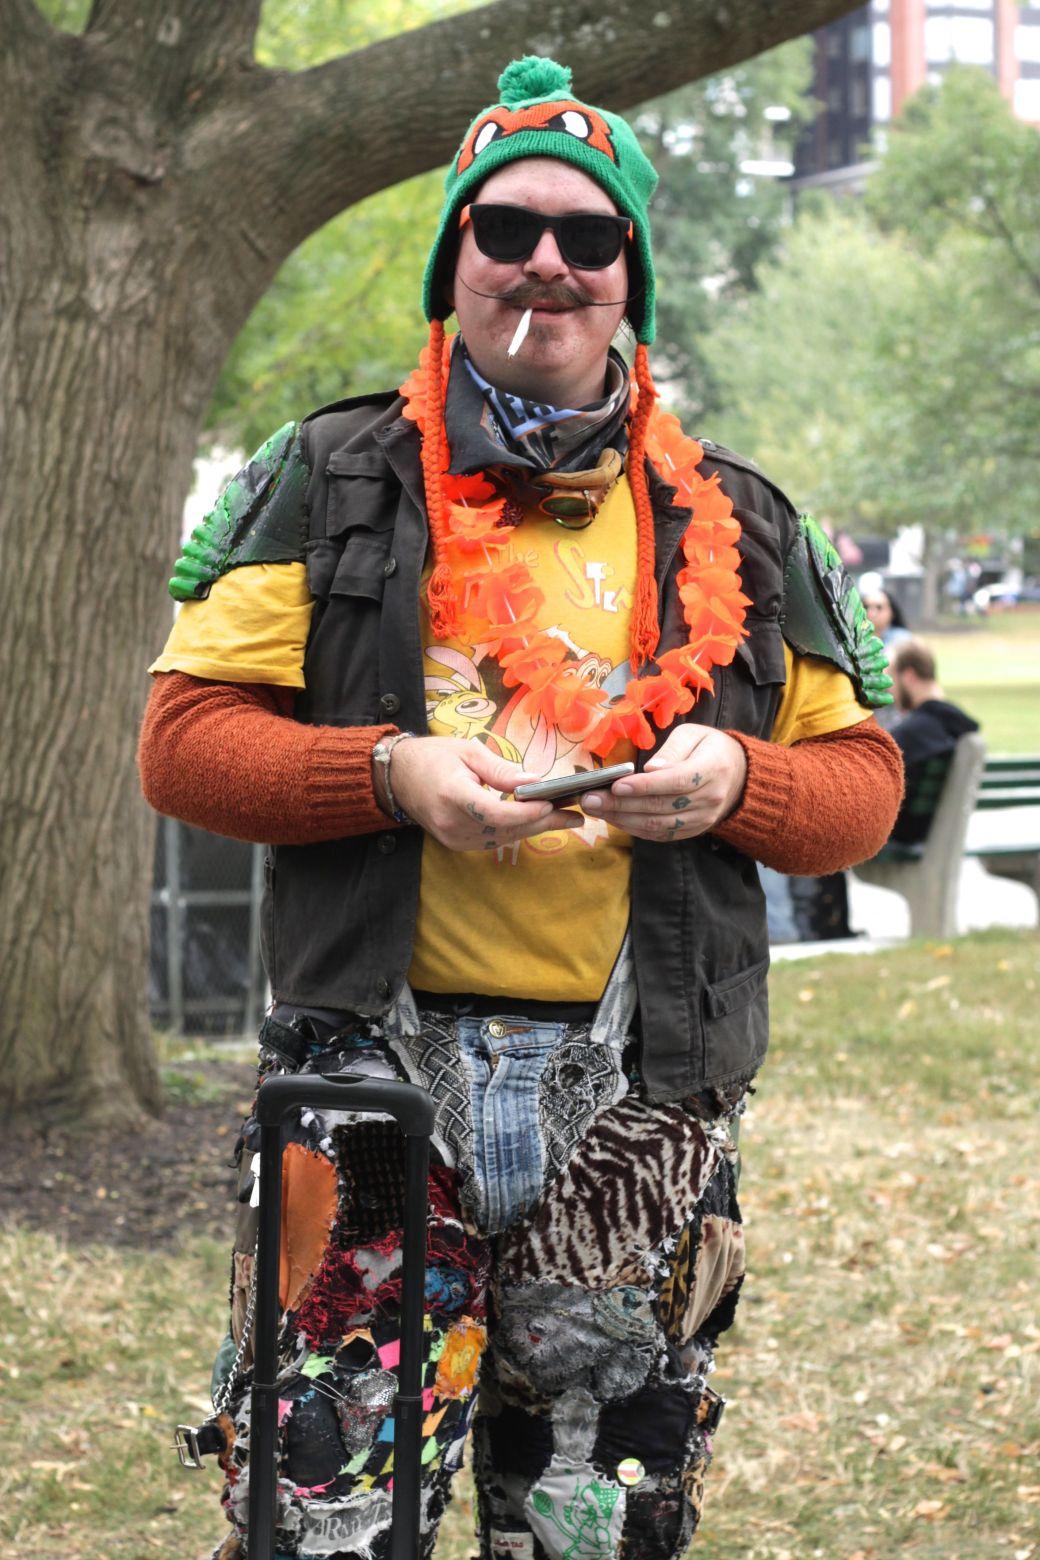 boston hemp fest 2014 park street people 3